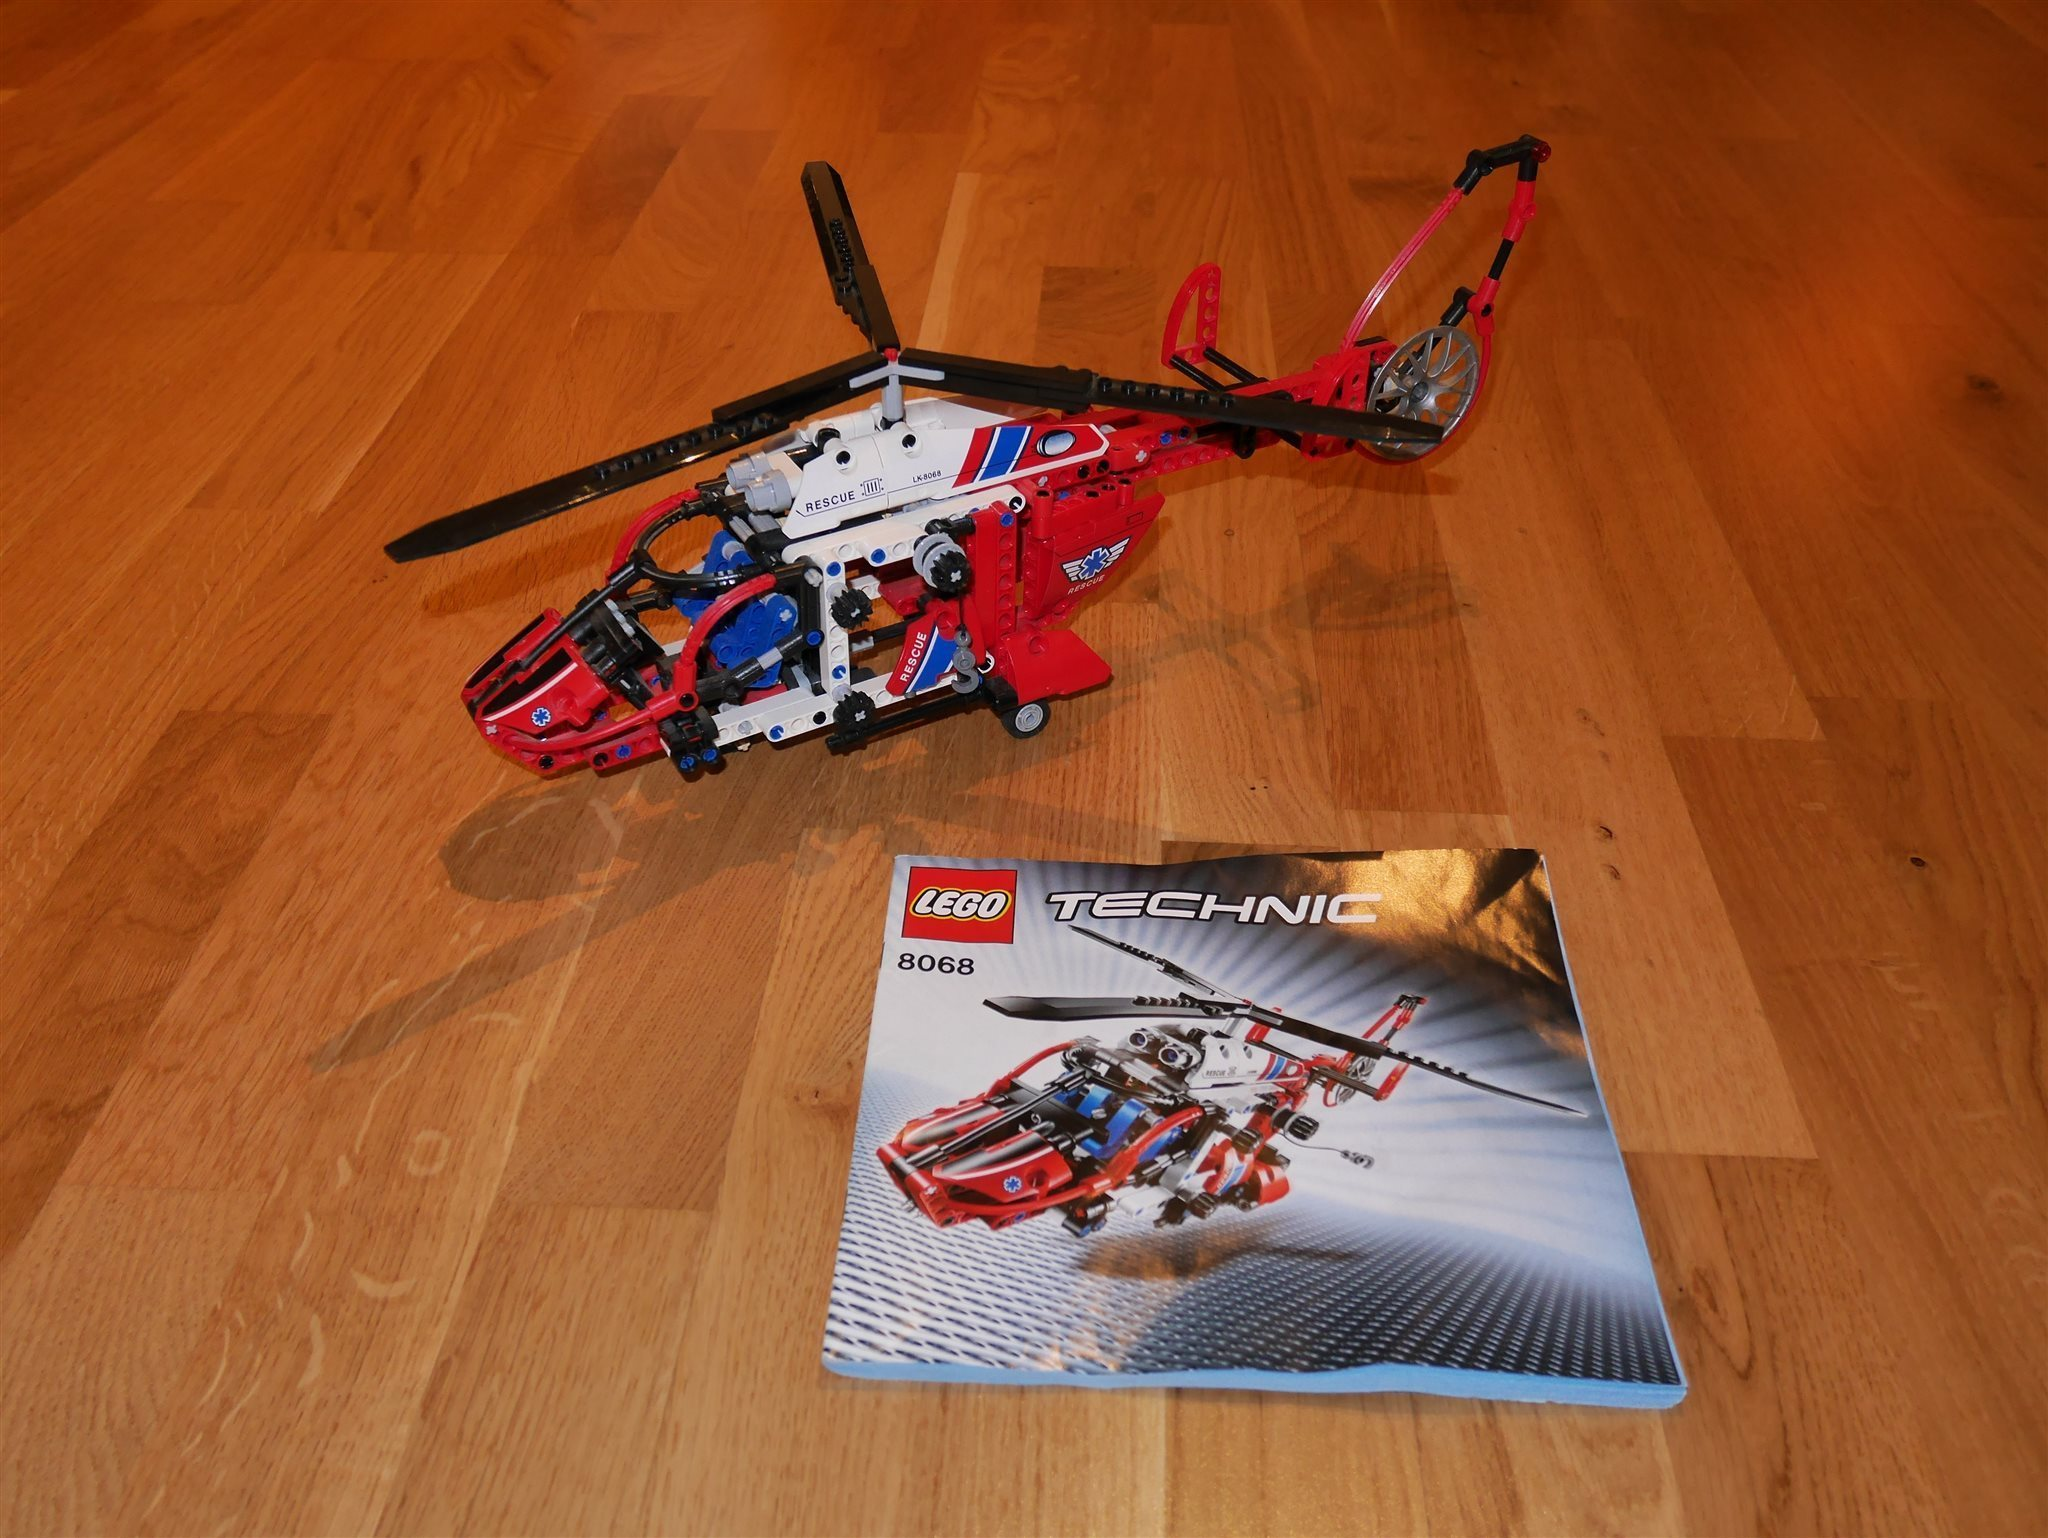 LEGO Technic 8068 Räddningshelikopter